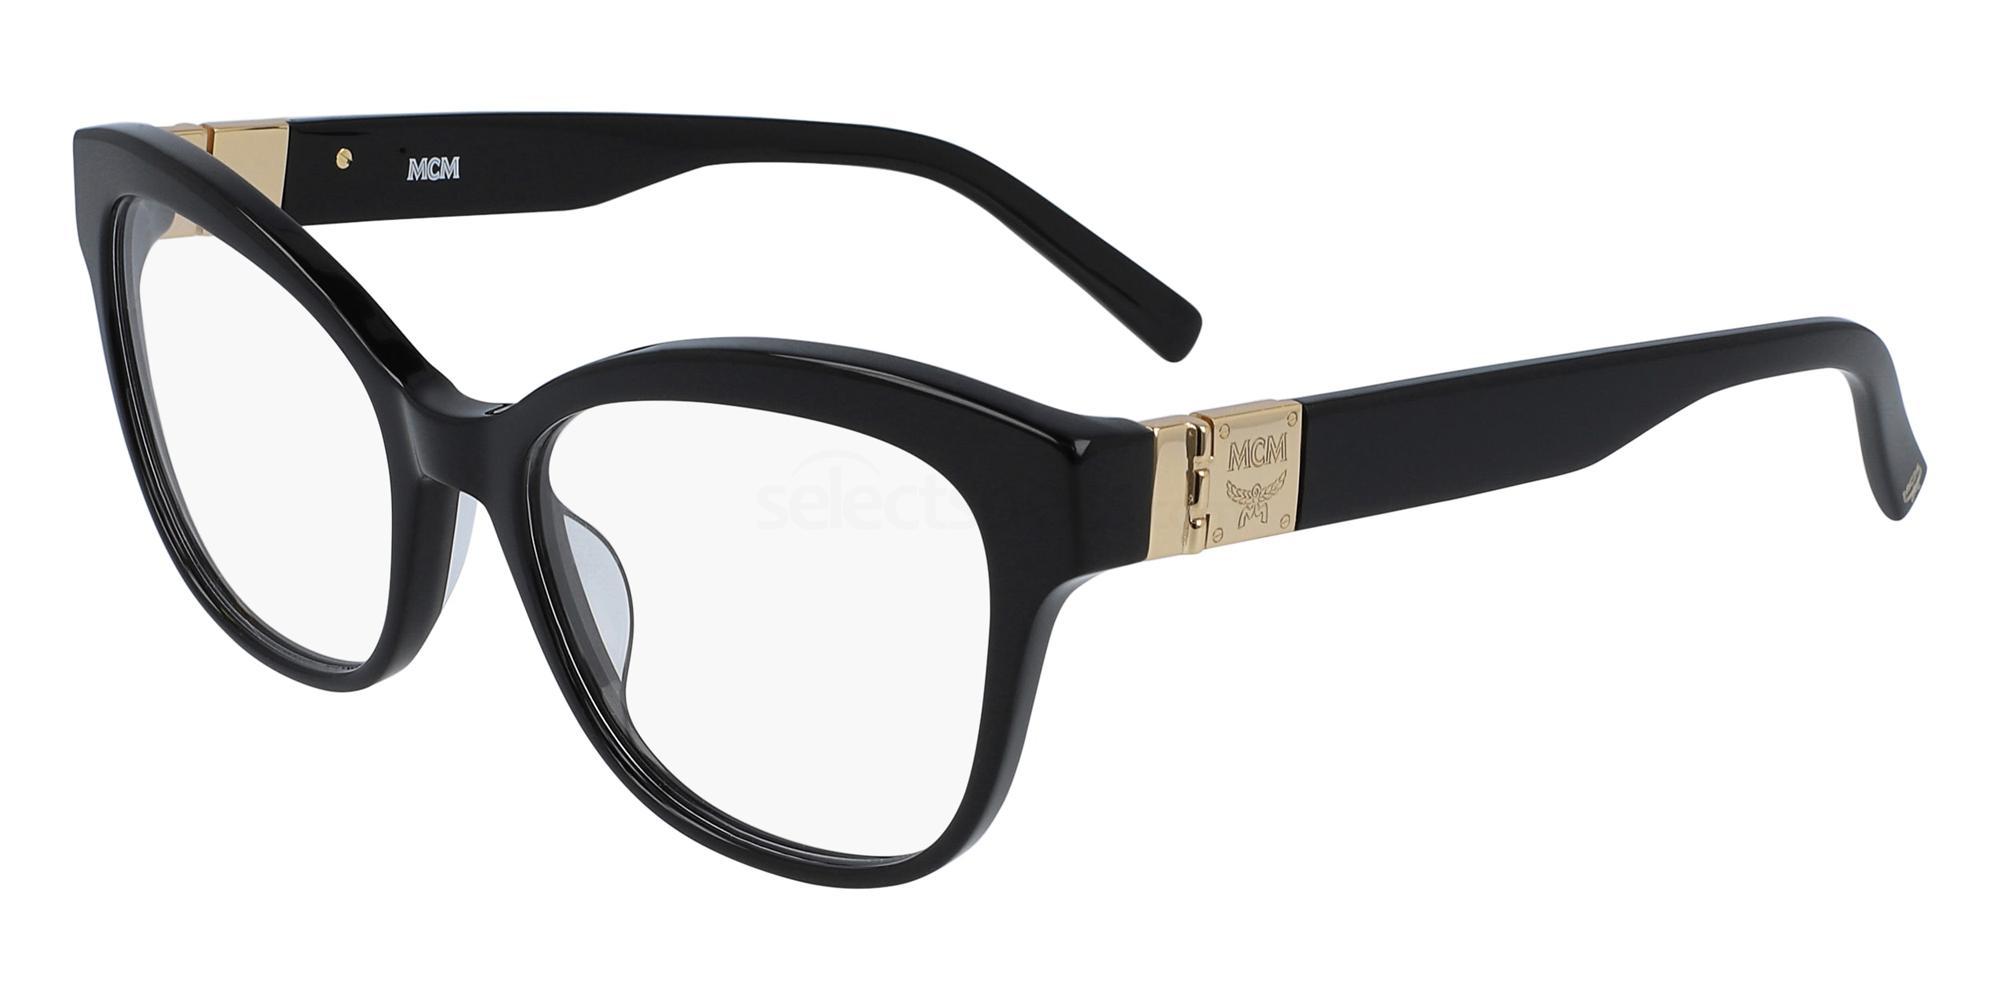 001 MCM2699 Glasses, MCM